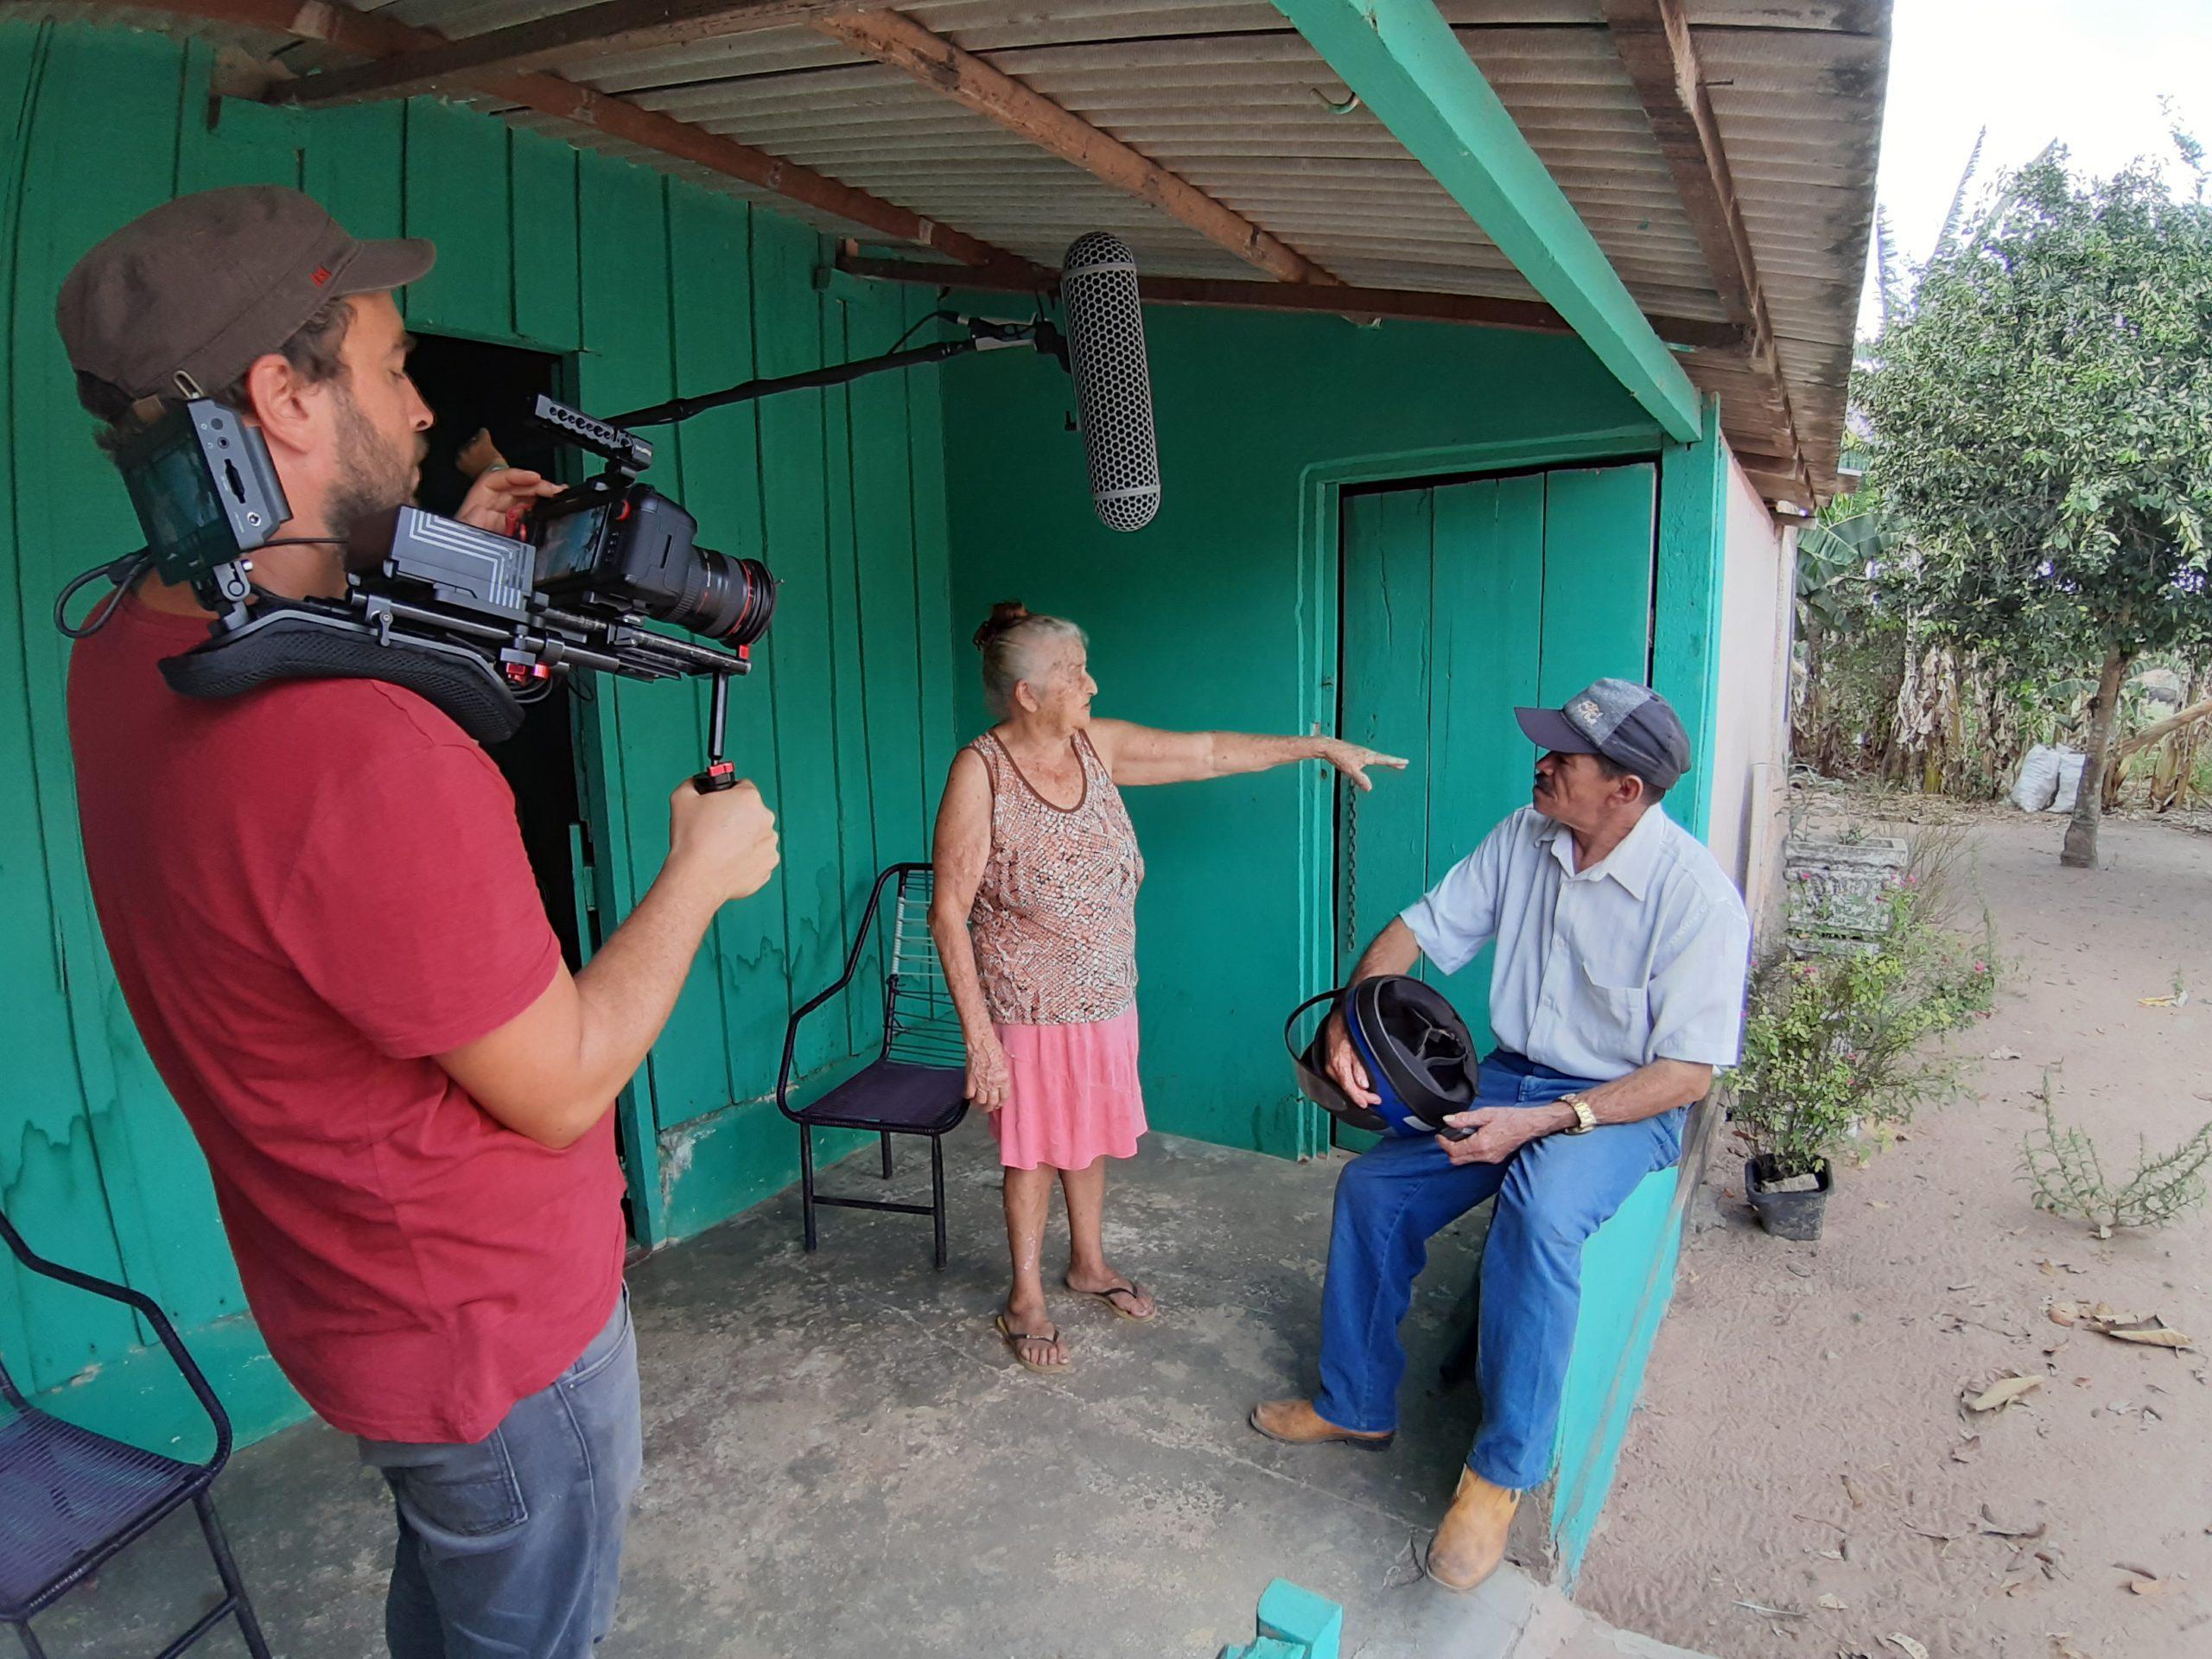 documentario brasile mani tese 2019